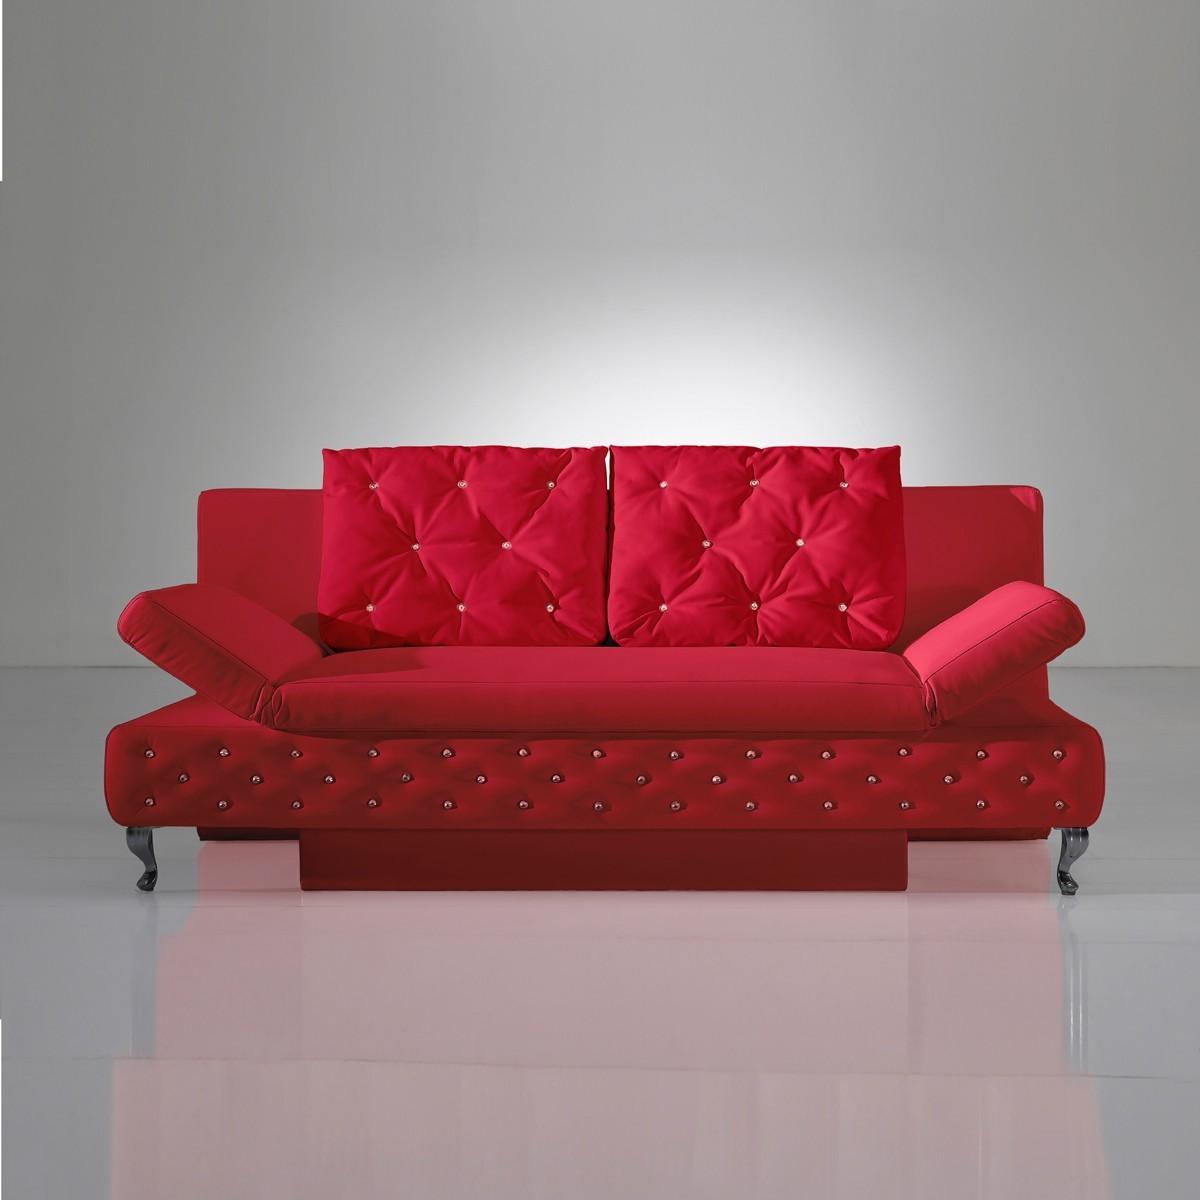 Schlafcouch schlafsofa sofa rokkoko in kunstleder rot for Sofa schlafcouch